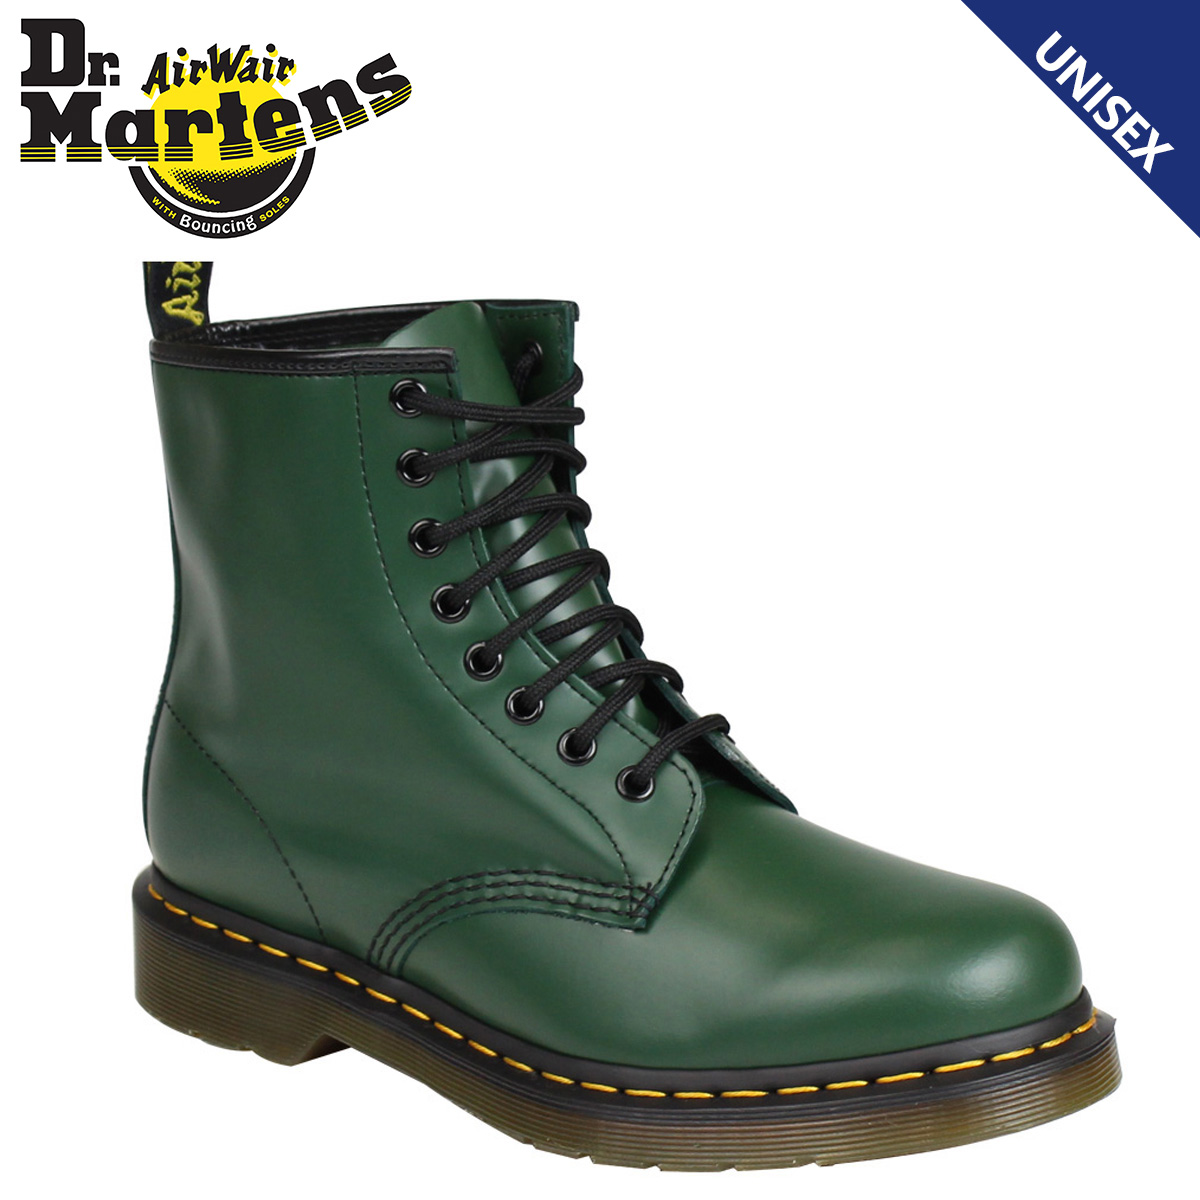 Dr.Martens ドクターマーチン 1460 8ホール ブーツ 8 EYE BOOT R11822207 メンズ レディース